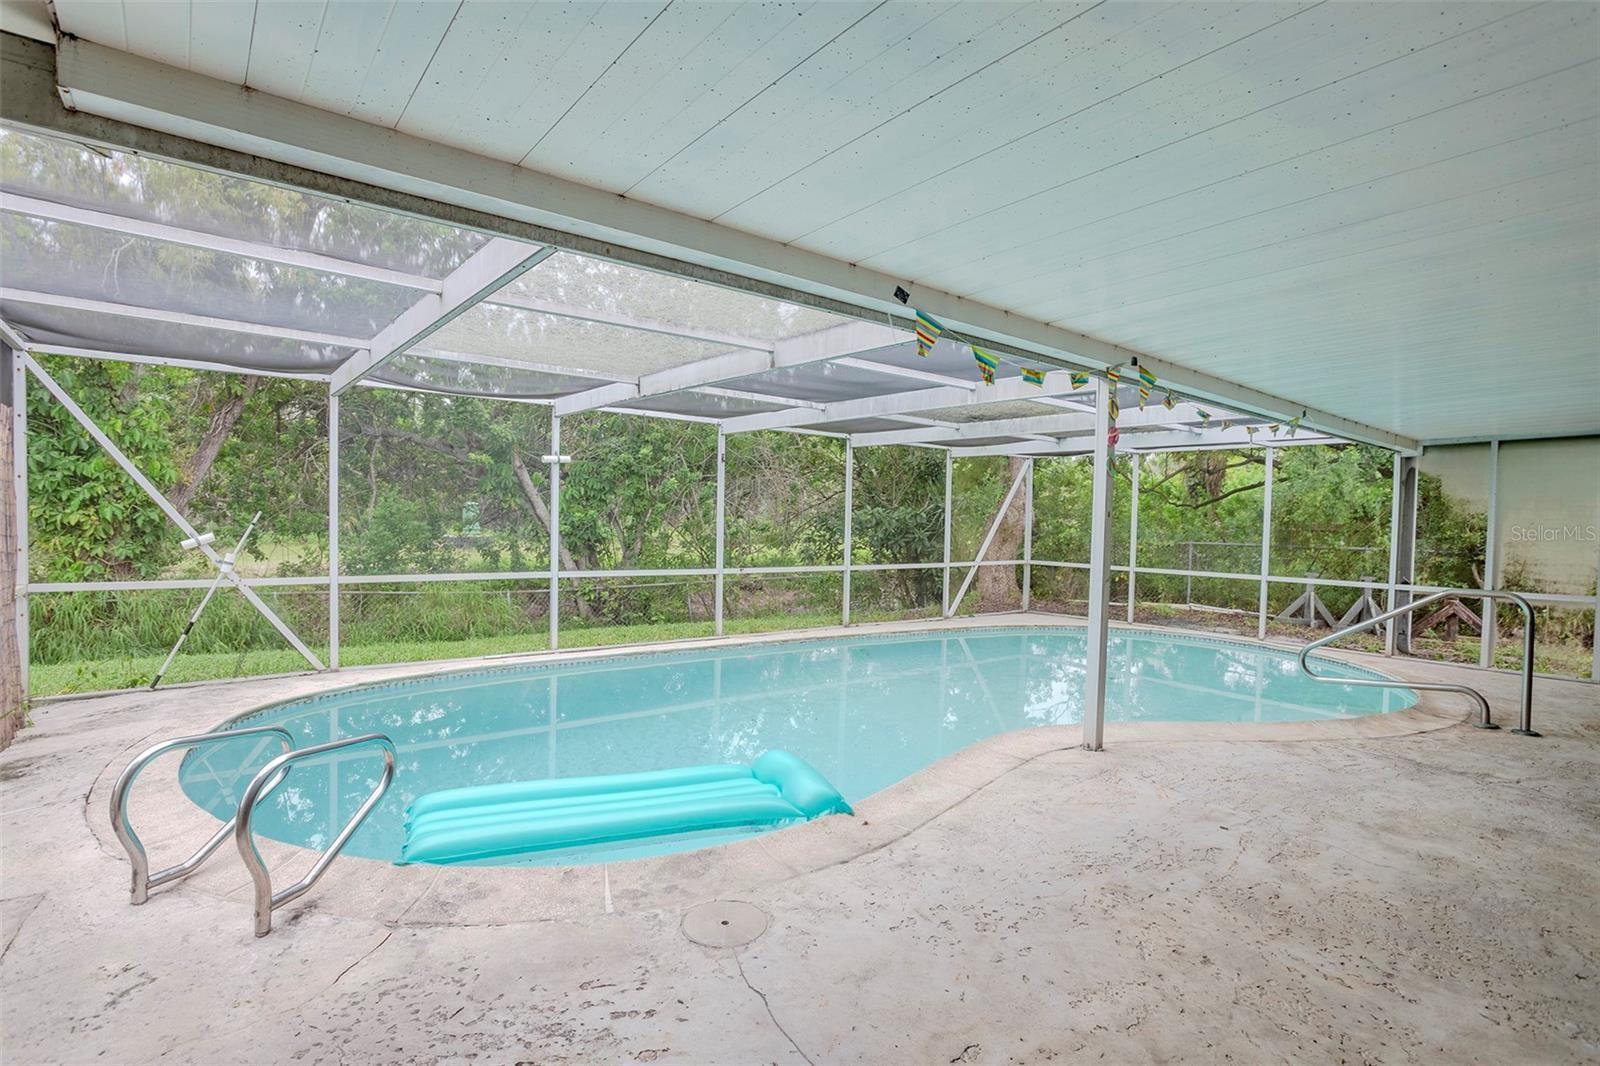 Photo of 10021 CHERRY CREEK LANE, PORT RICHEY, FL 34668 (MLS # U8131977)